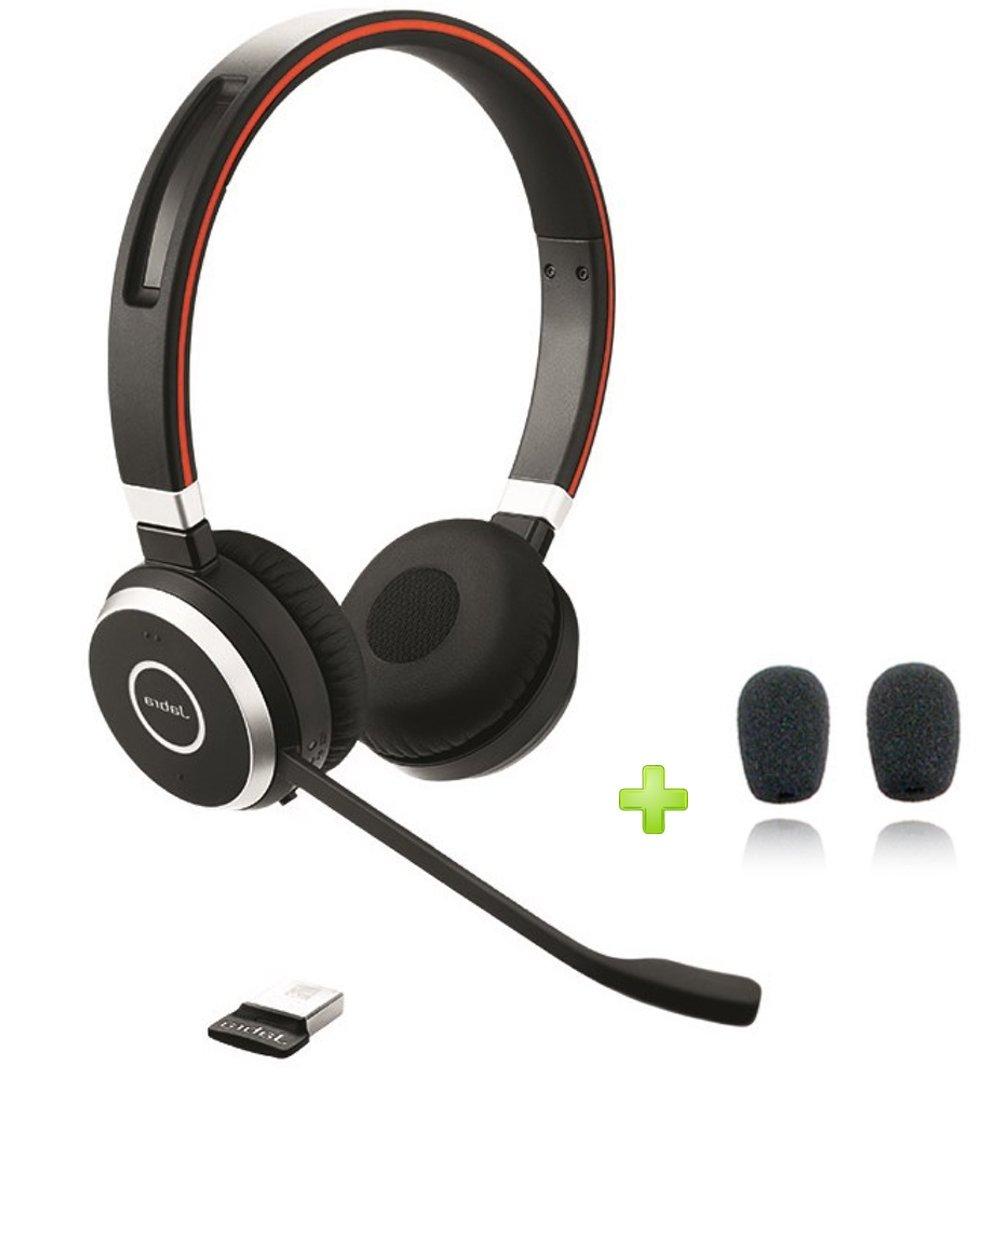 Jabra Evolve 65 Bluetooth UC (DUO) NFC Headphones Bundle   Windows PC, Surface, MAC, Smartphone, Mobile, Streaming Music, IP Softphones, NFC   6599-829-409-C   Bonus Premium Microphone Cushions